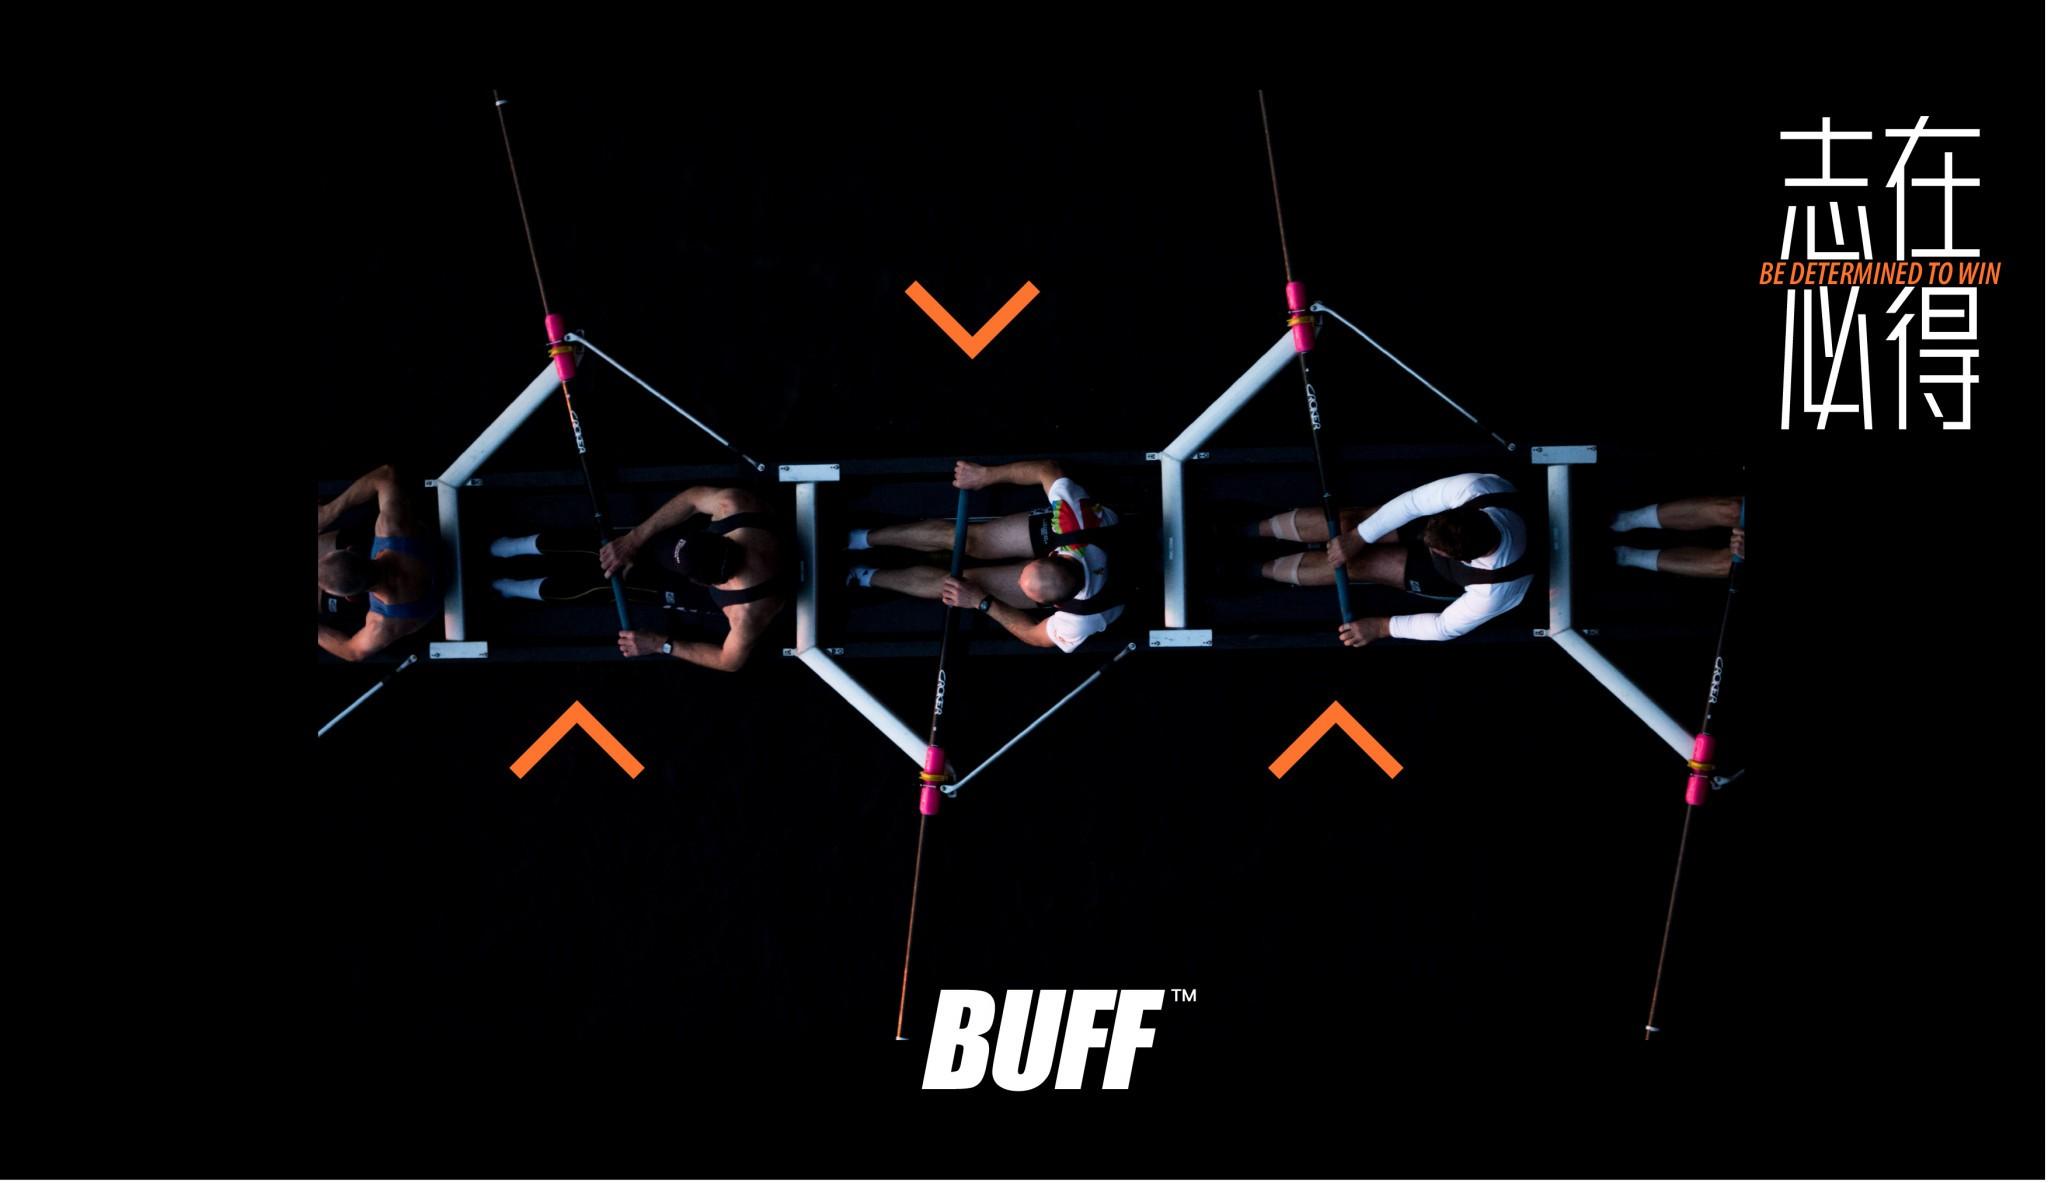 BUFF-07